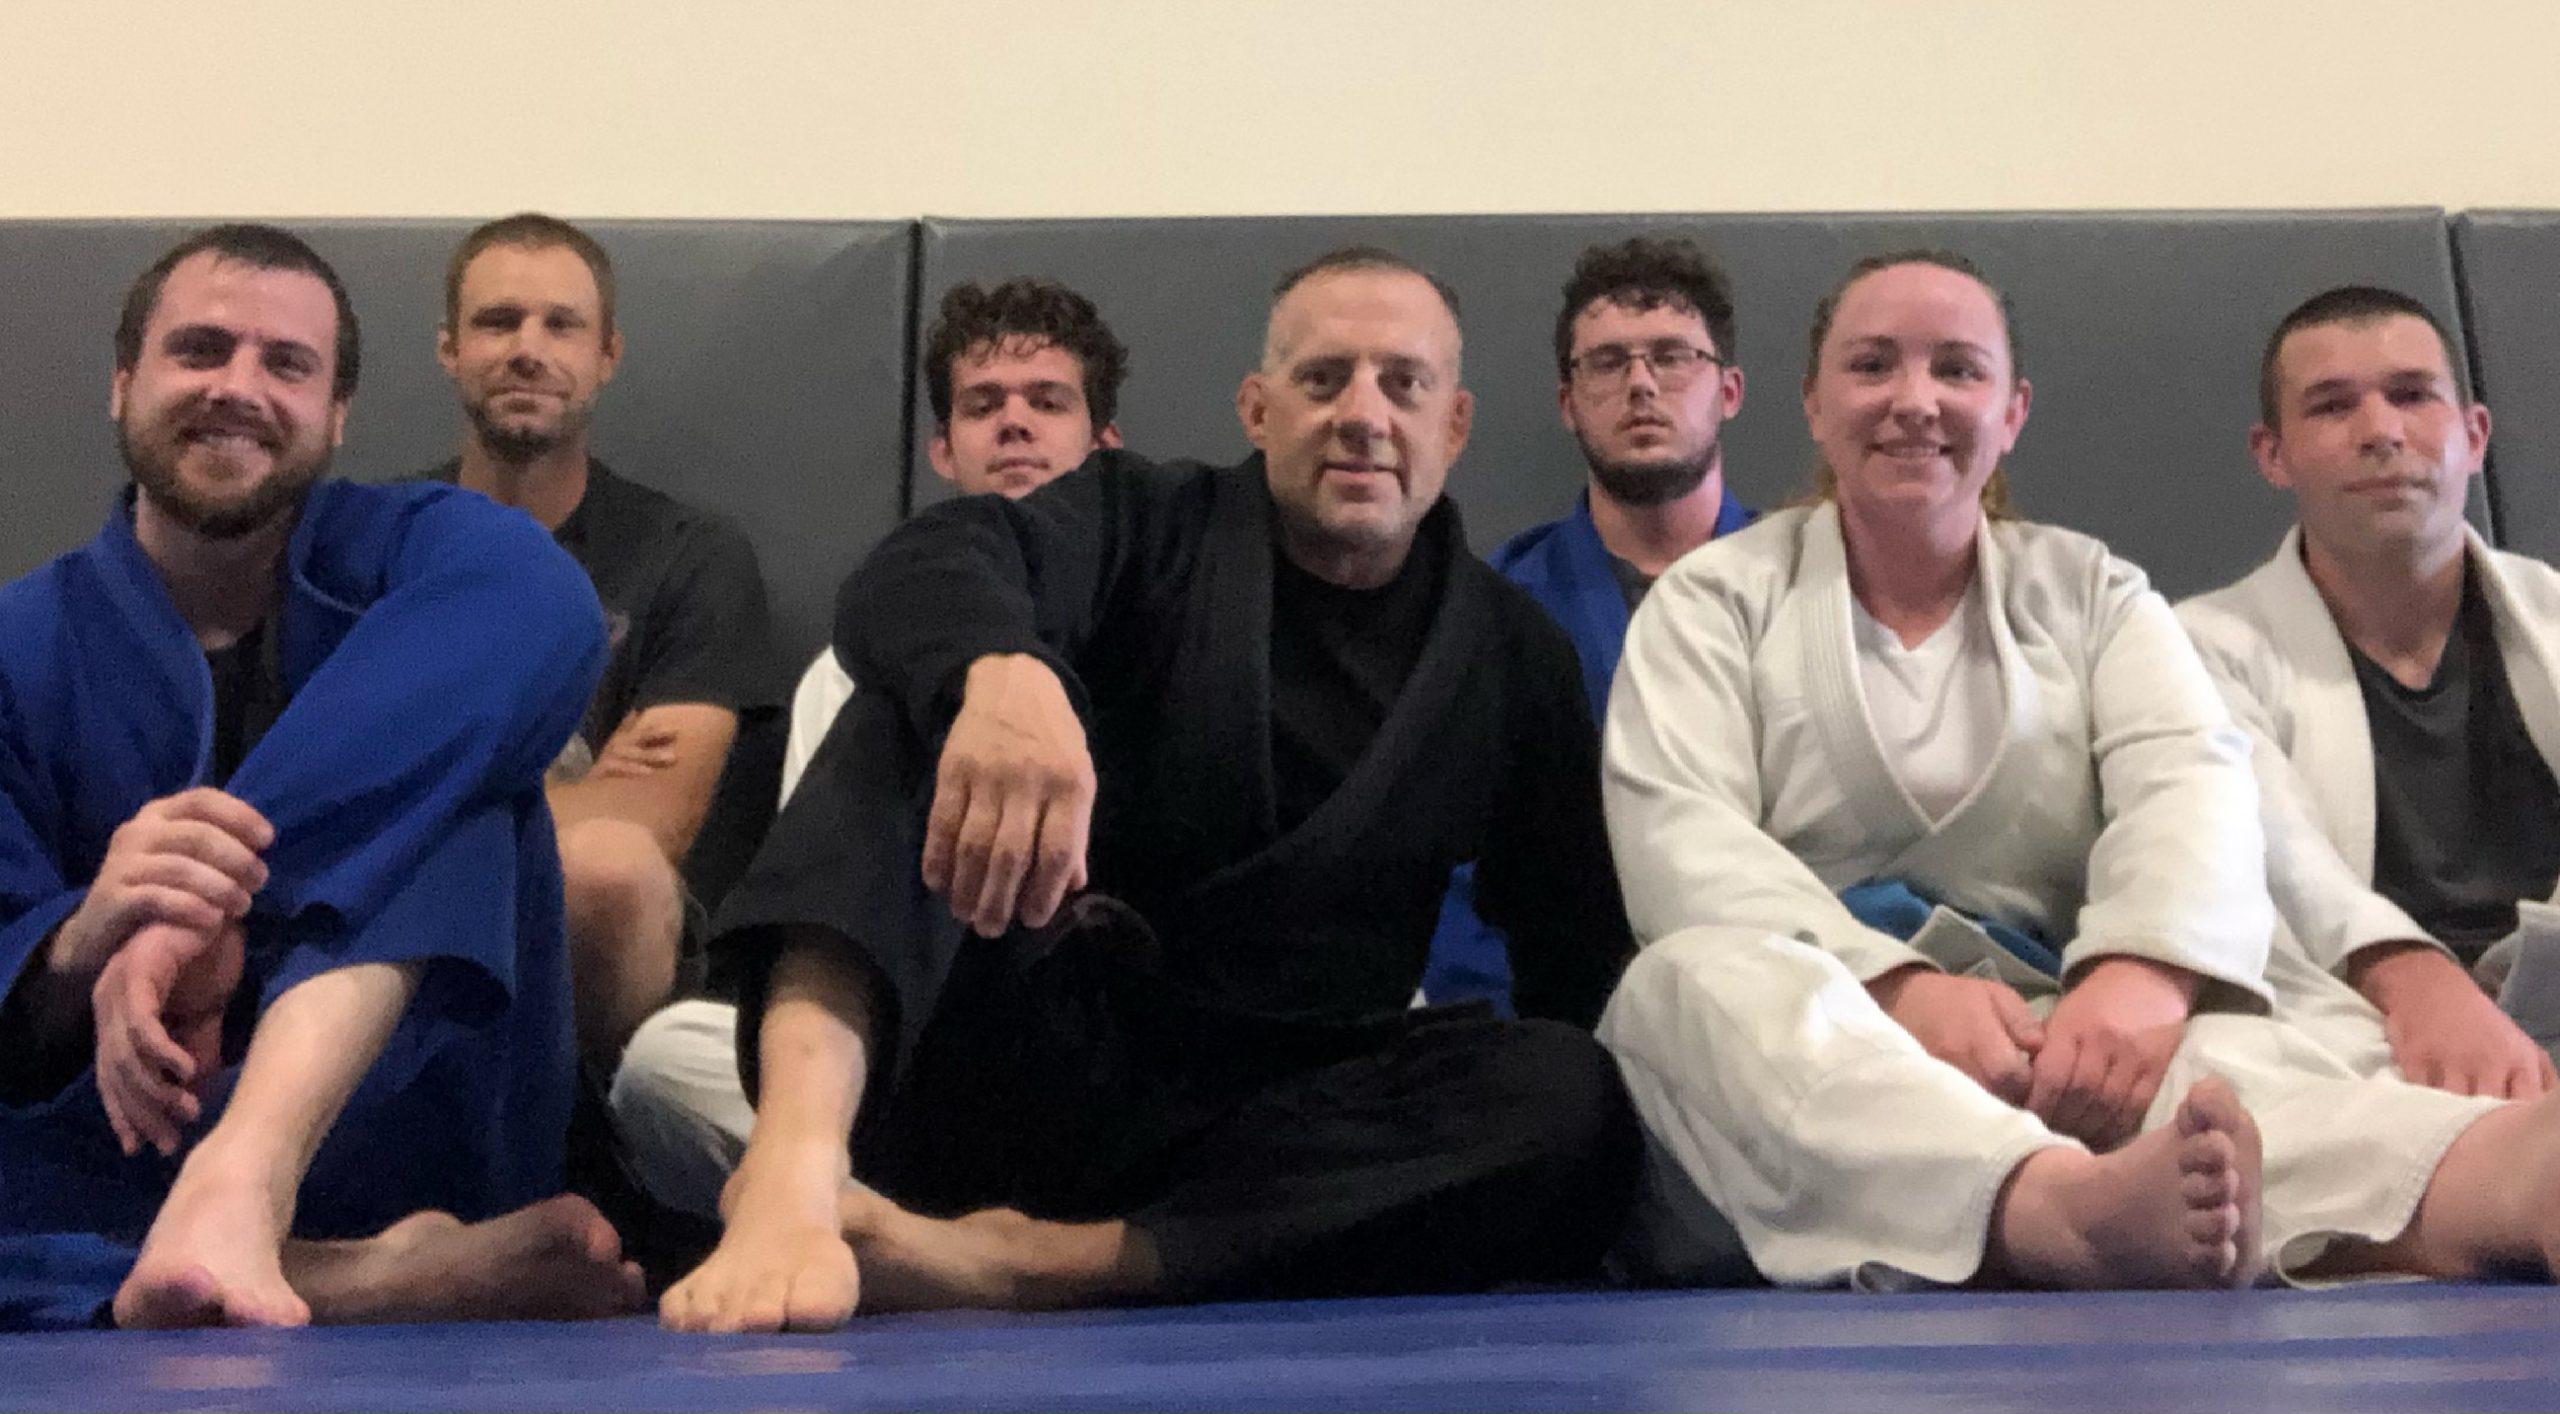 East Montgomery Martial Arts